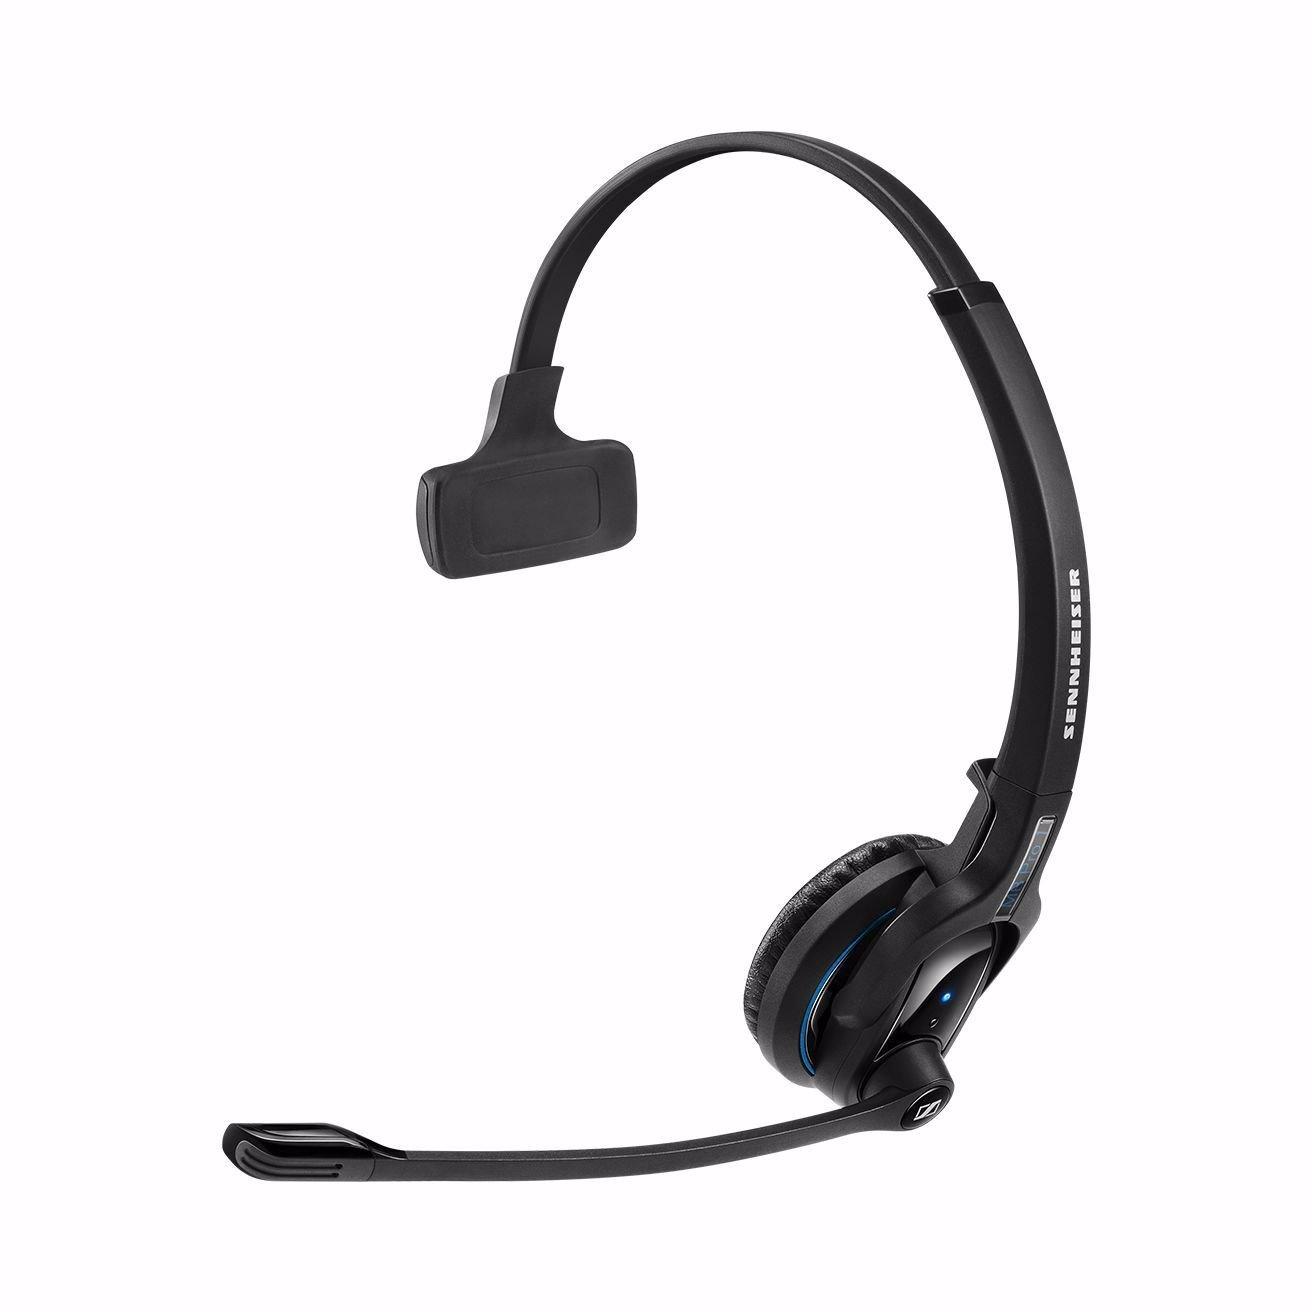 Sennheiser MB Pro 1 Wireless Over-the-head Mono Headset